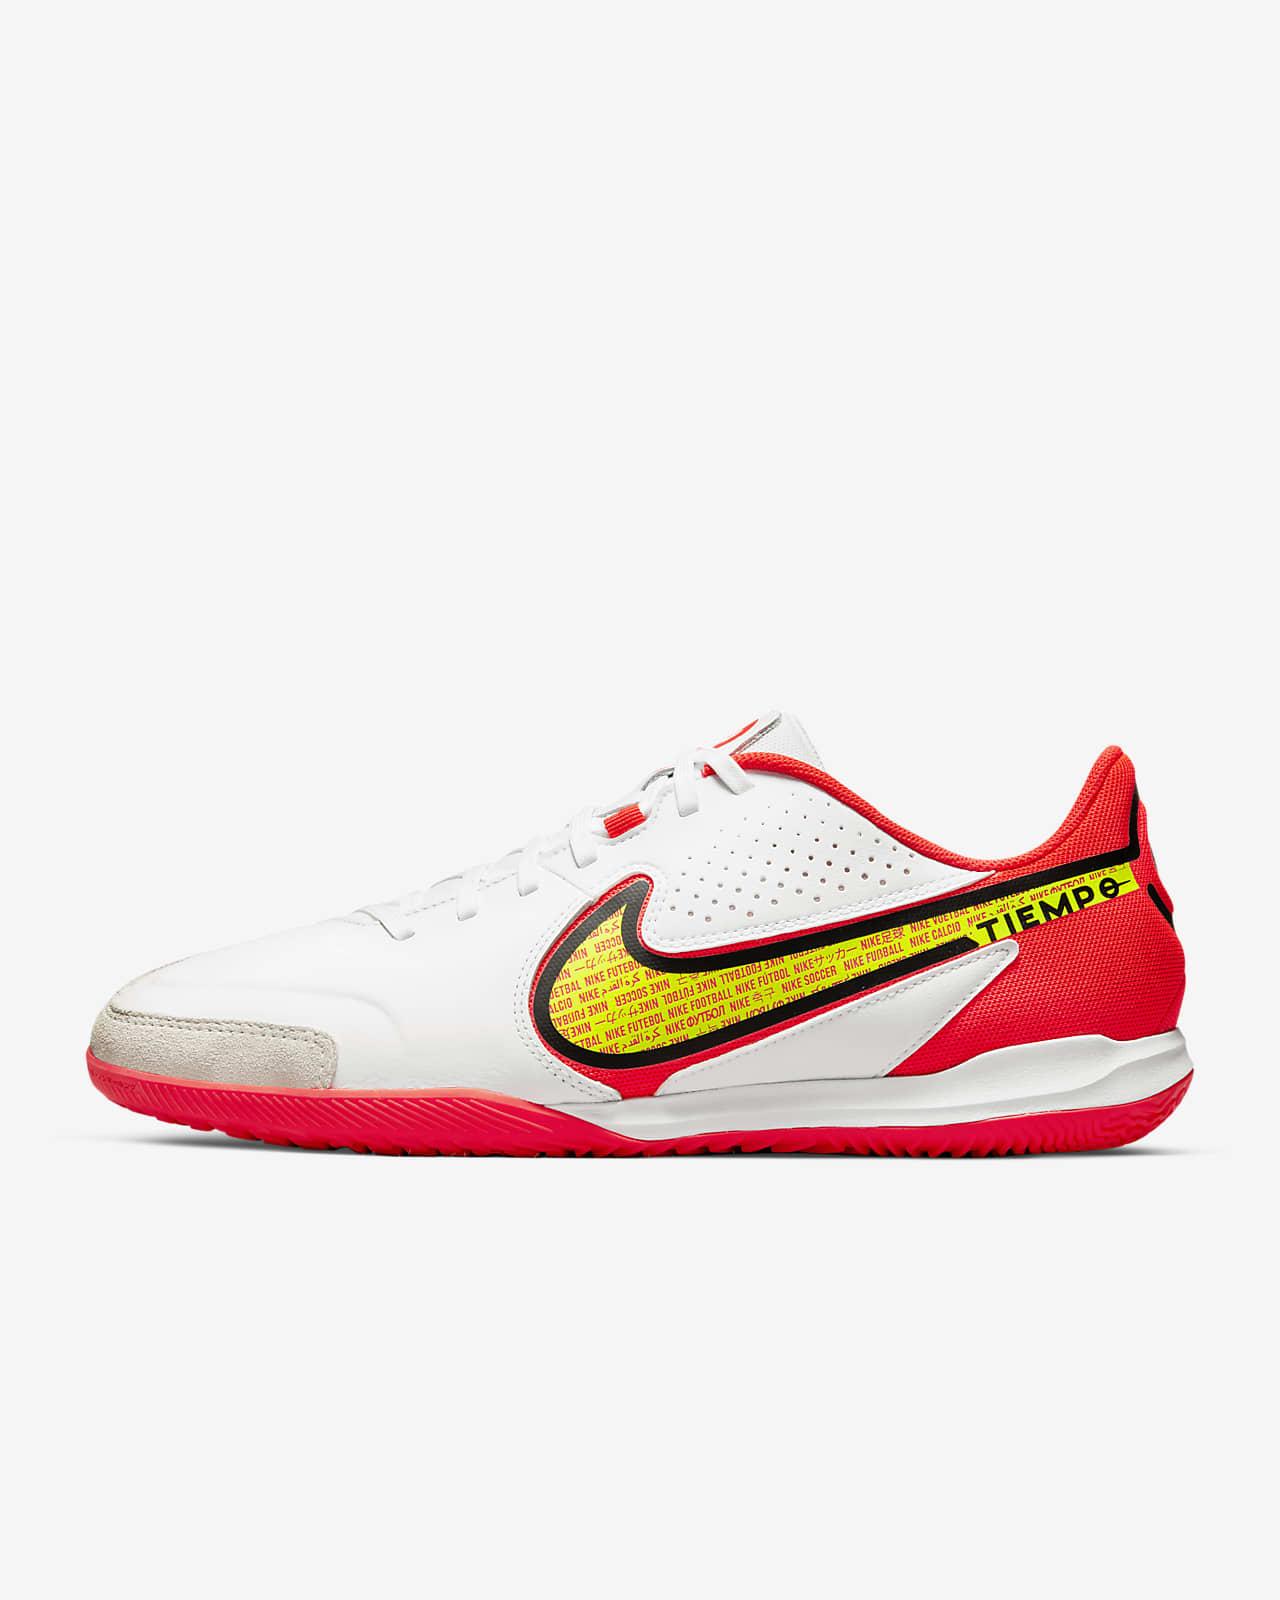 Chaussure de football en salle Nike Tiempo Legend 9 Academy IC